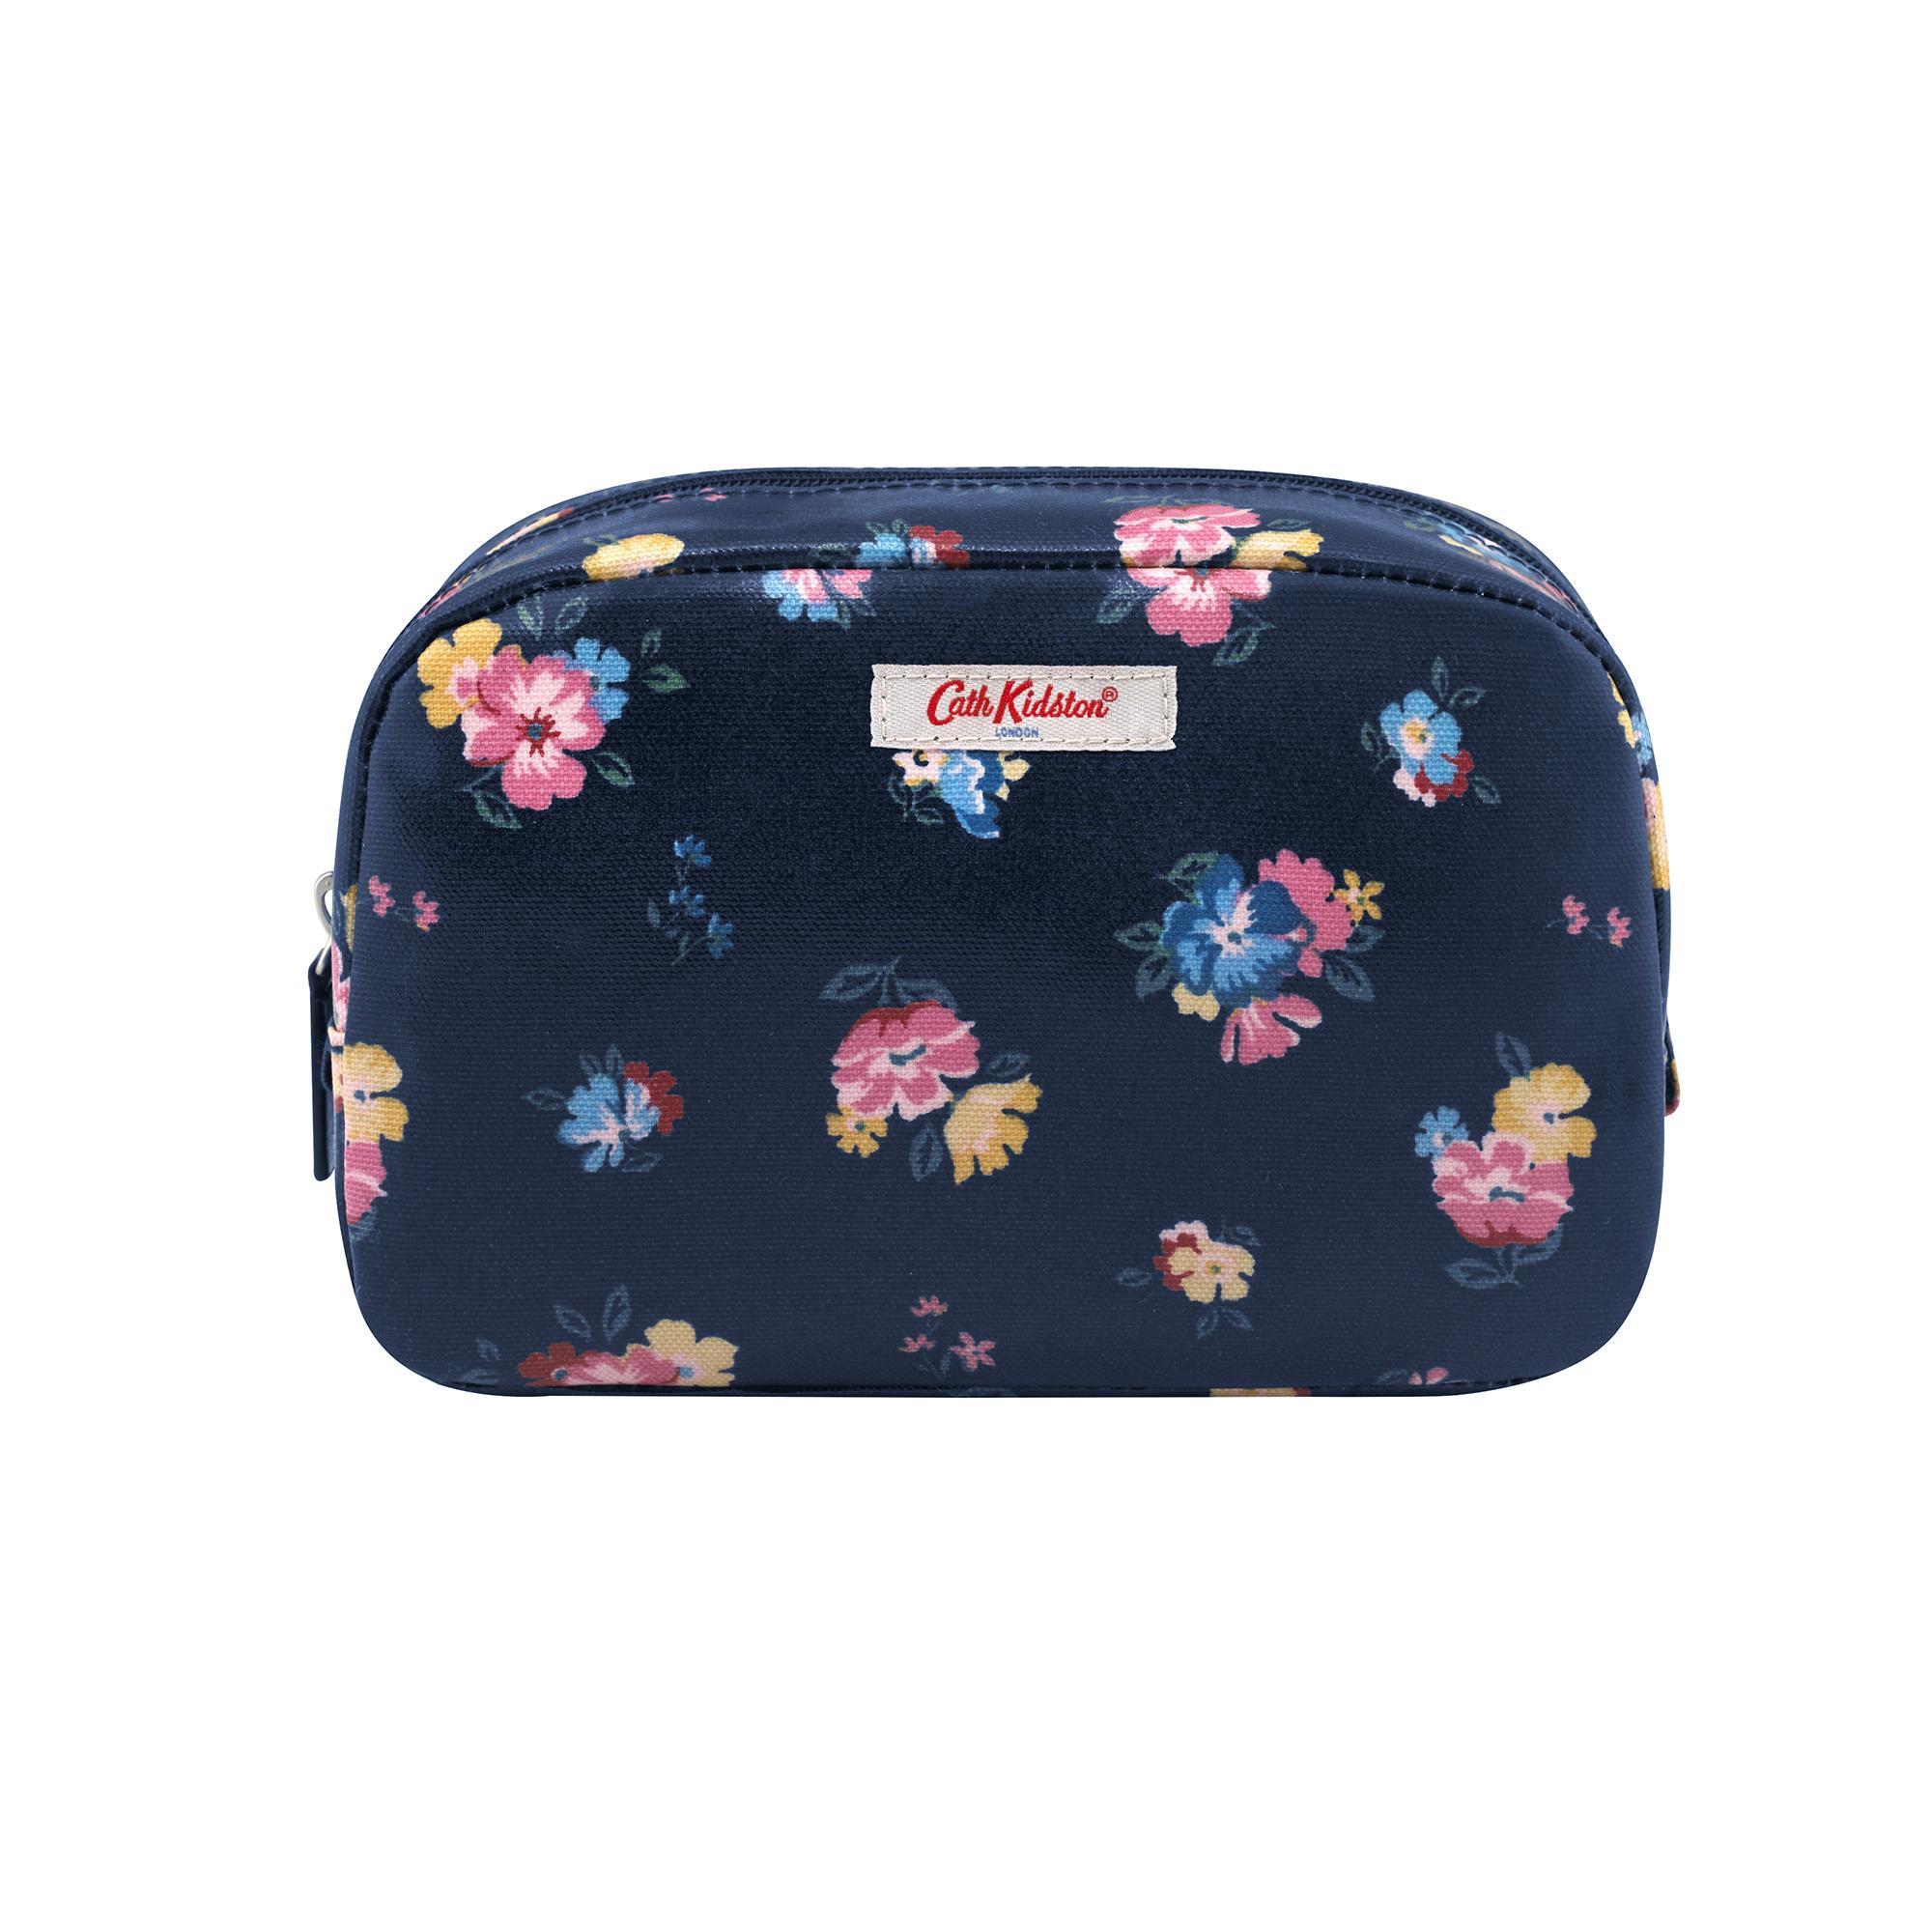 Cosmetic bag, £14, Cath Kidston